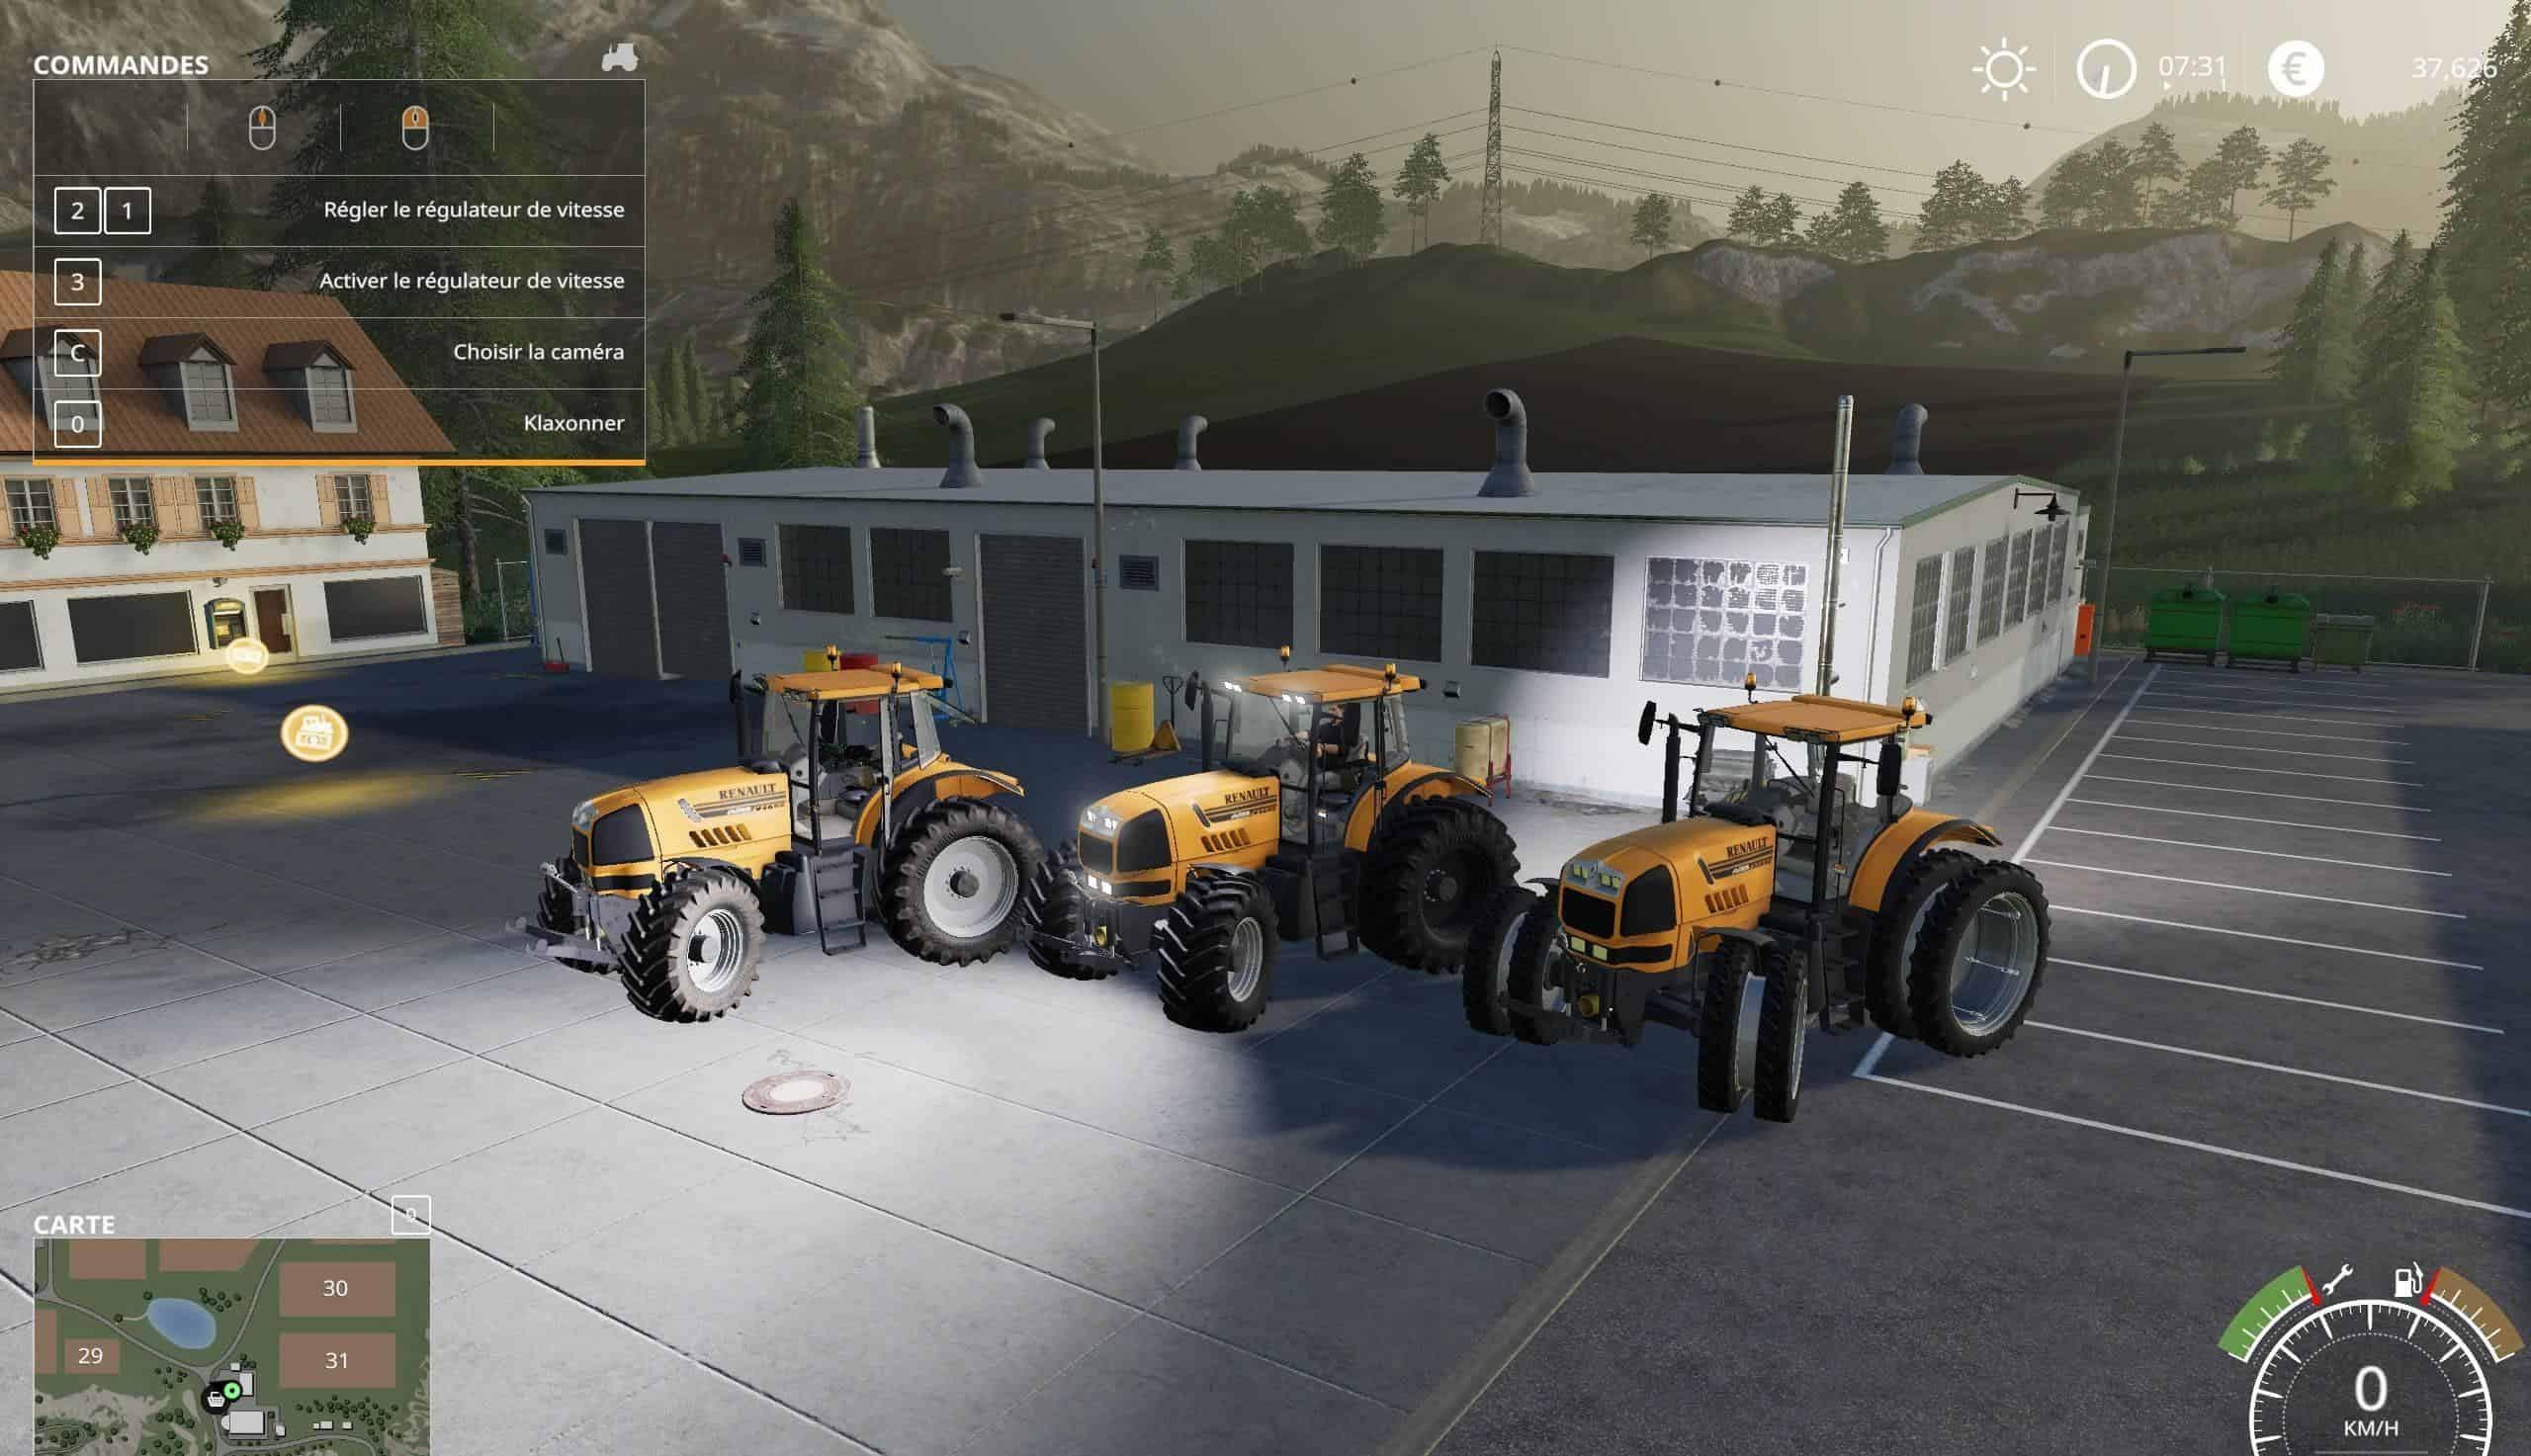 Renault Atles V10 Fs19 Farming Simulator 19 Mod Fs19 Mod